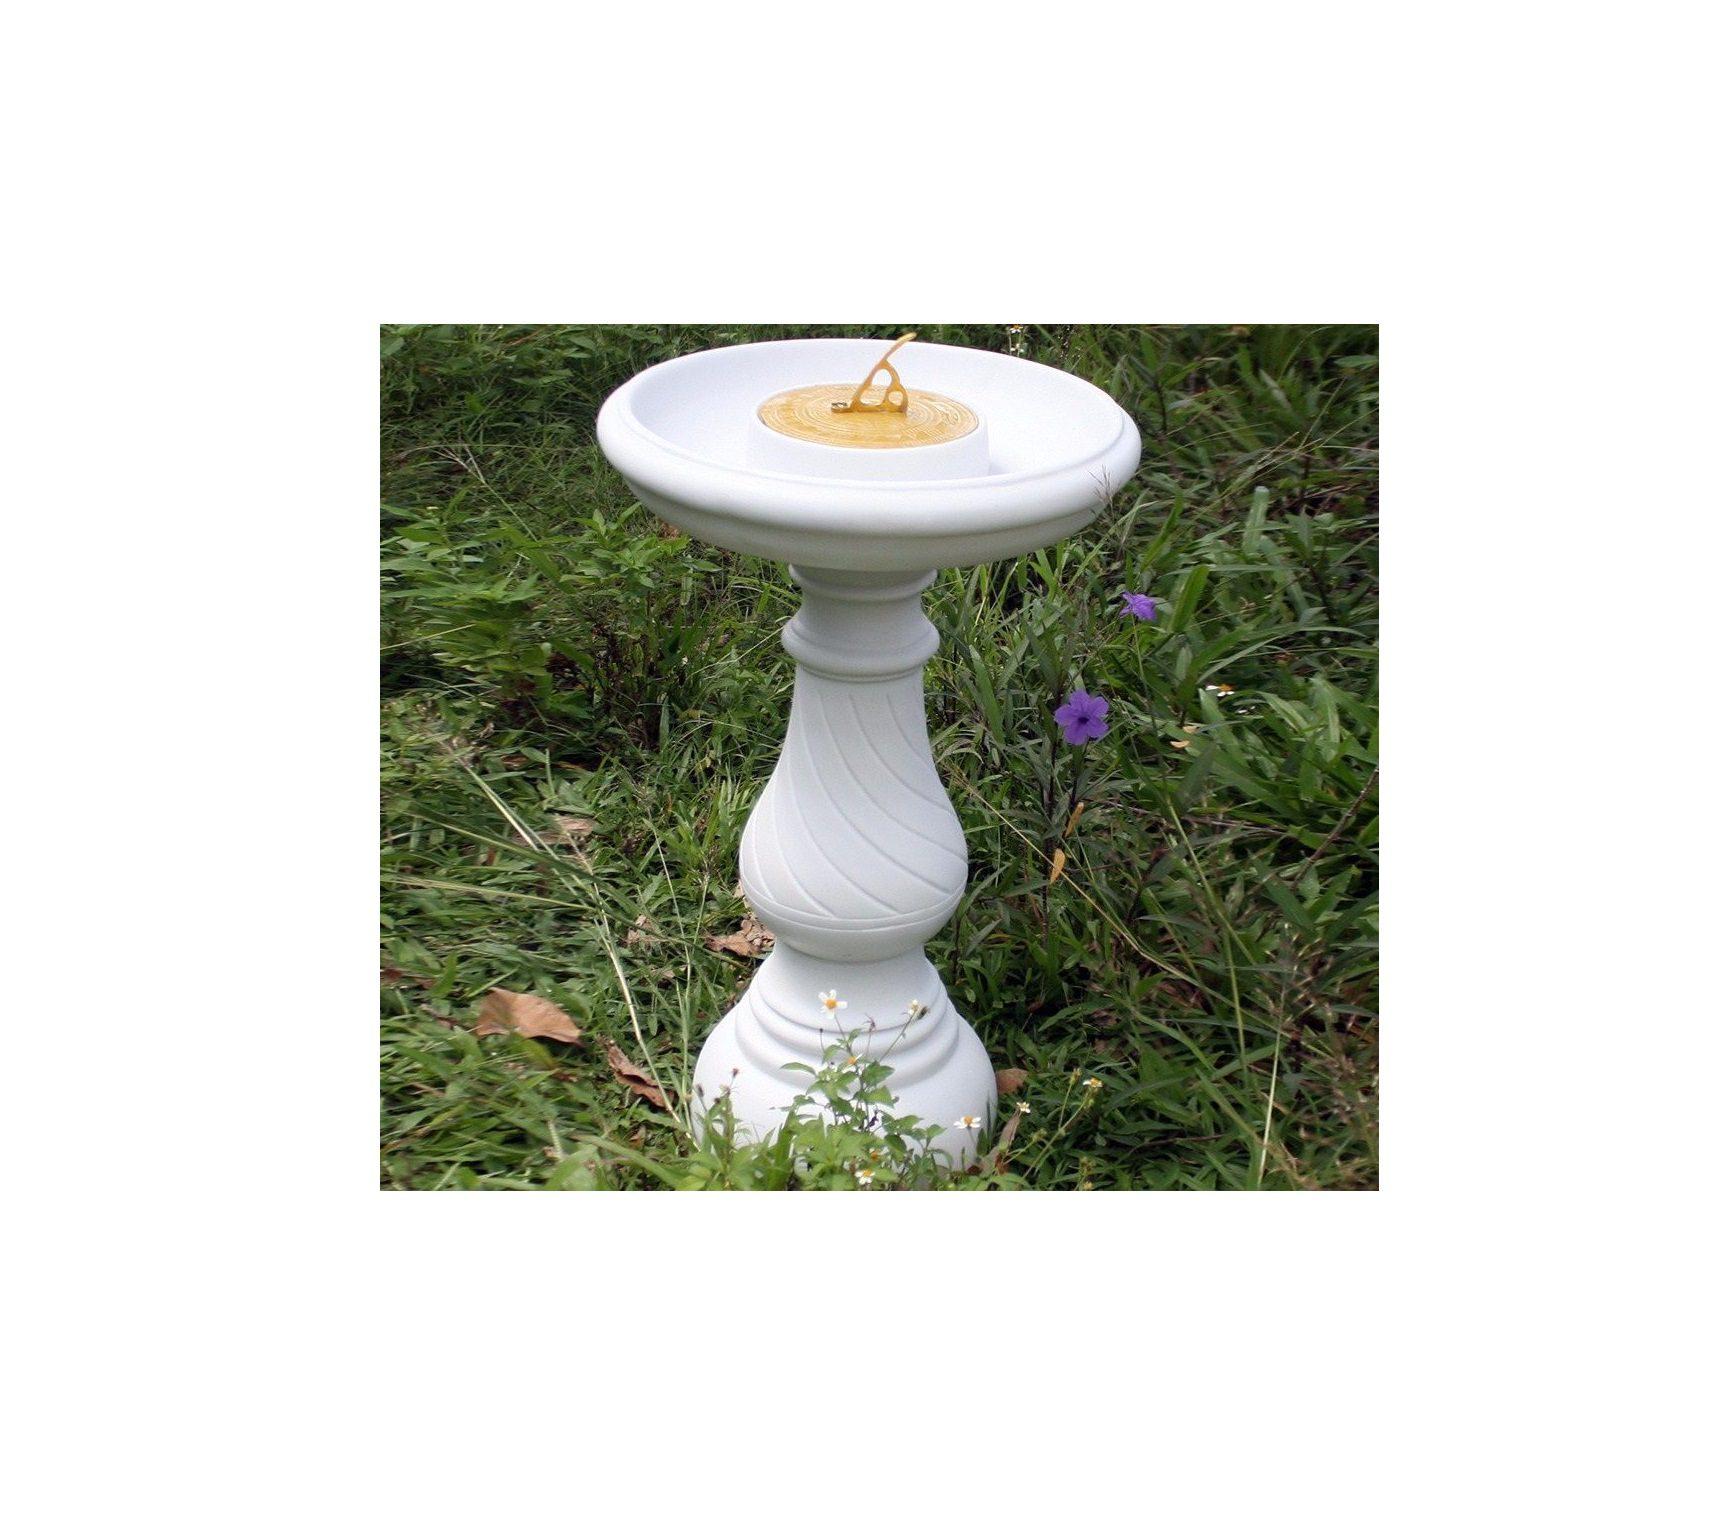 Swirl White Sundial 0124E83Db3166Fd9A380681754F9F998 Original